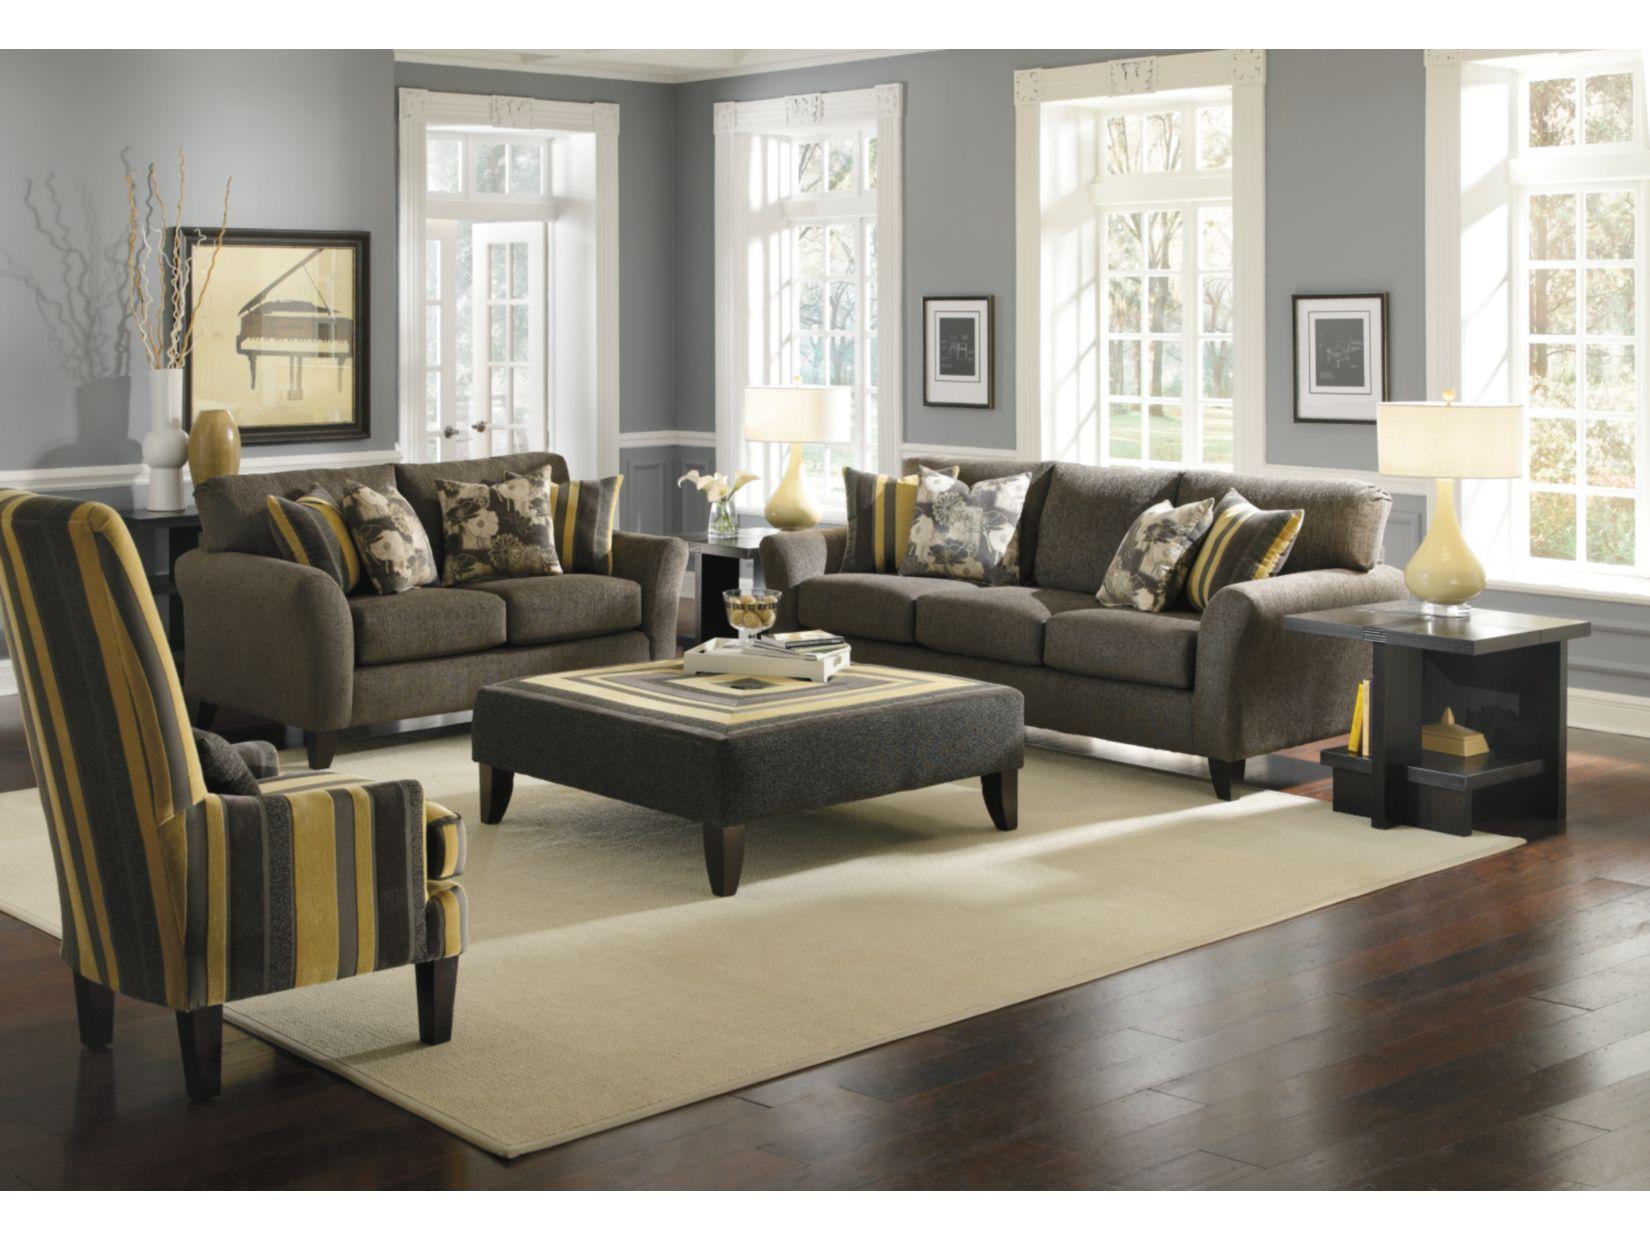 Cassidy Charcoal set Living Room ideas Pinterest